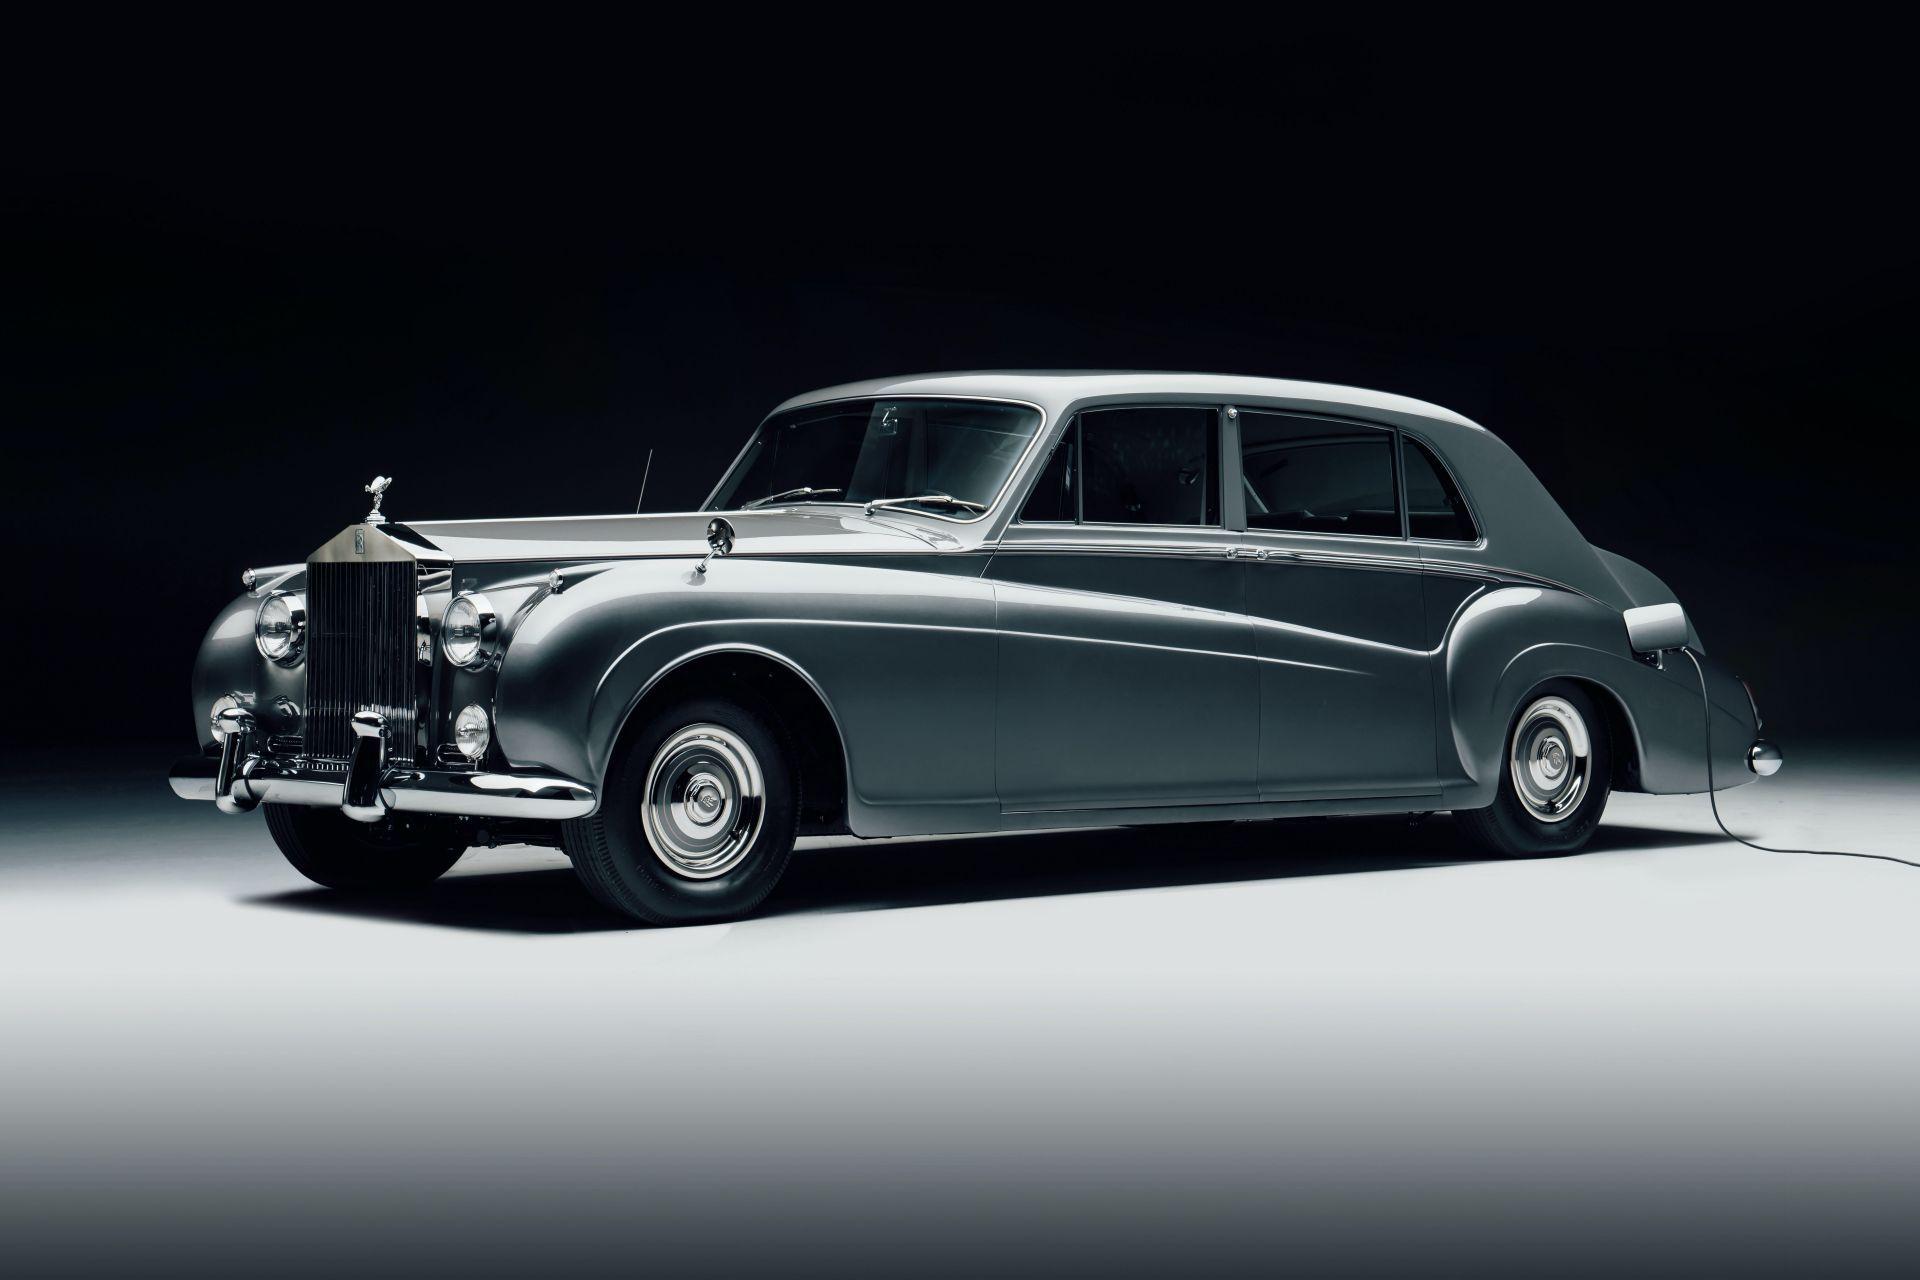 Electris-Rolls-Royce-Phantom-V-and-Silver-Cloud-by-Lunaz-17